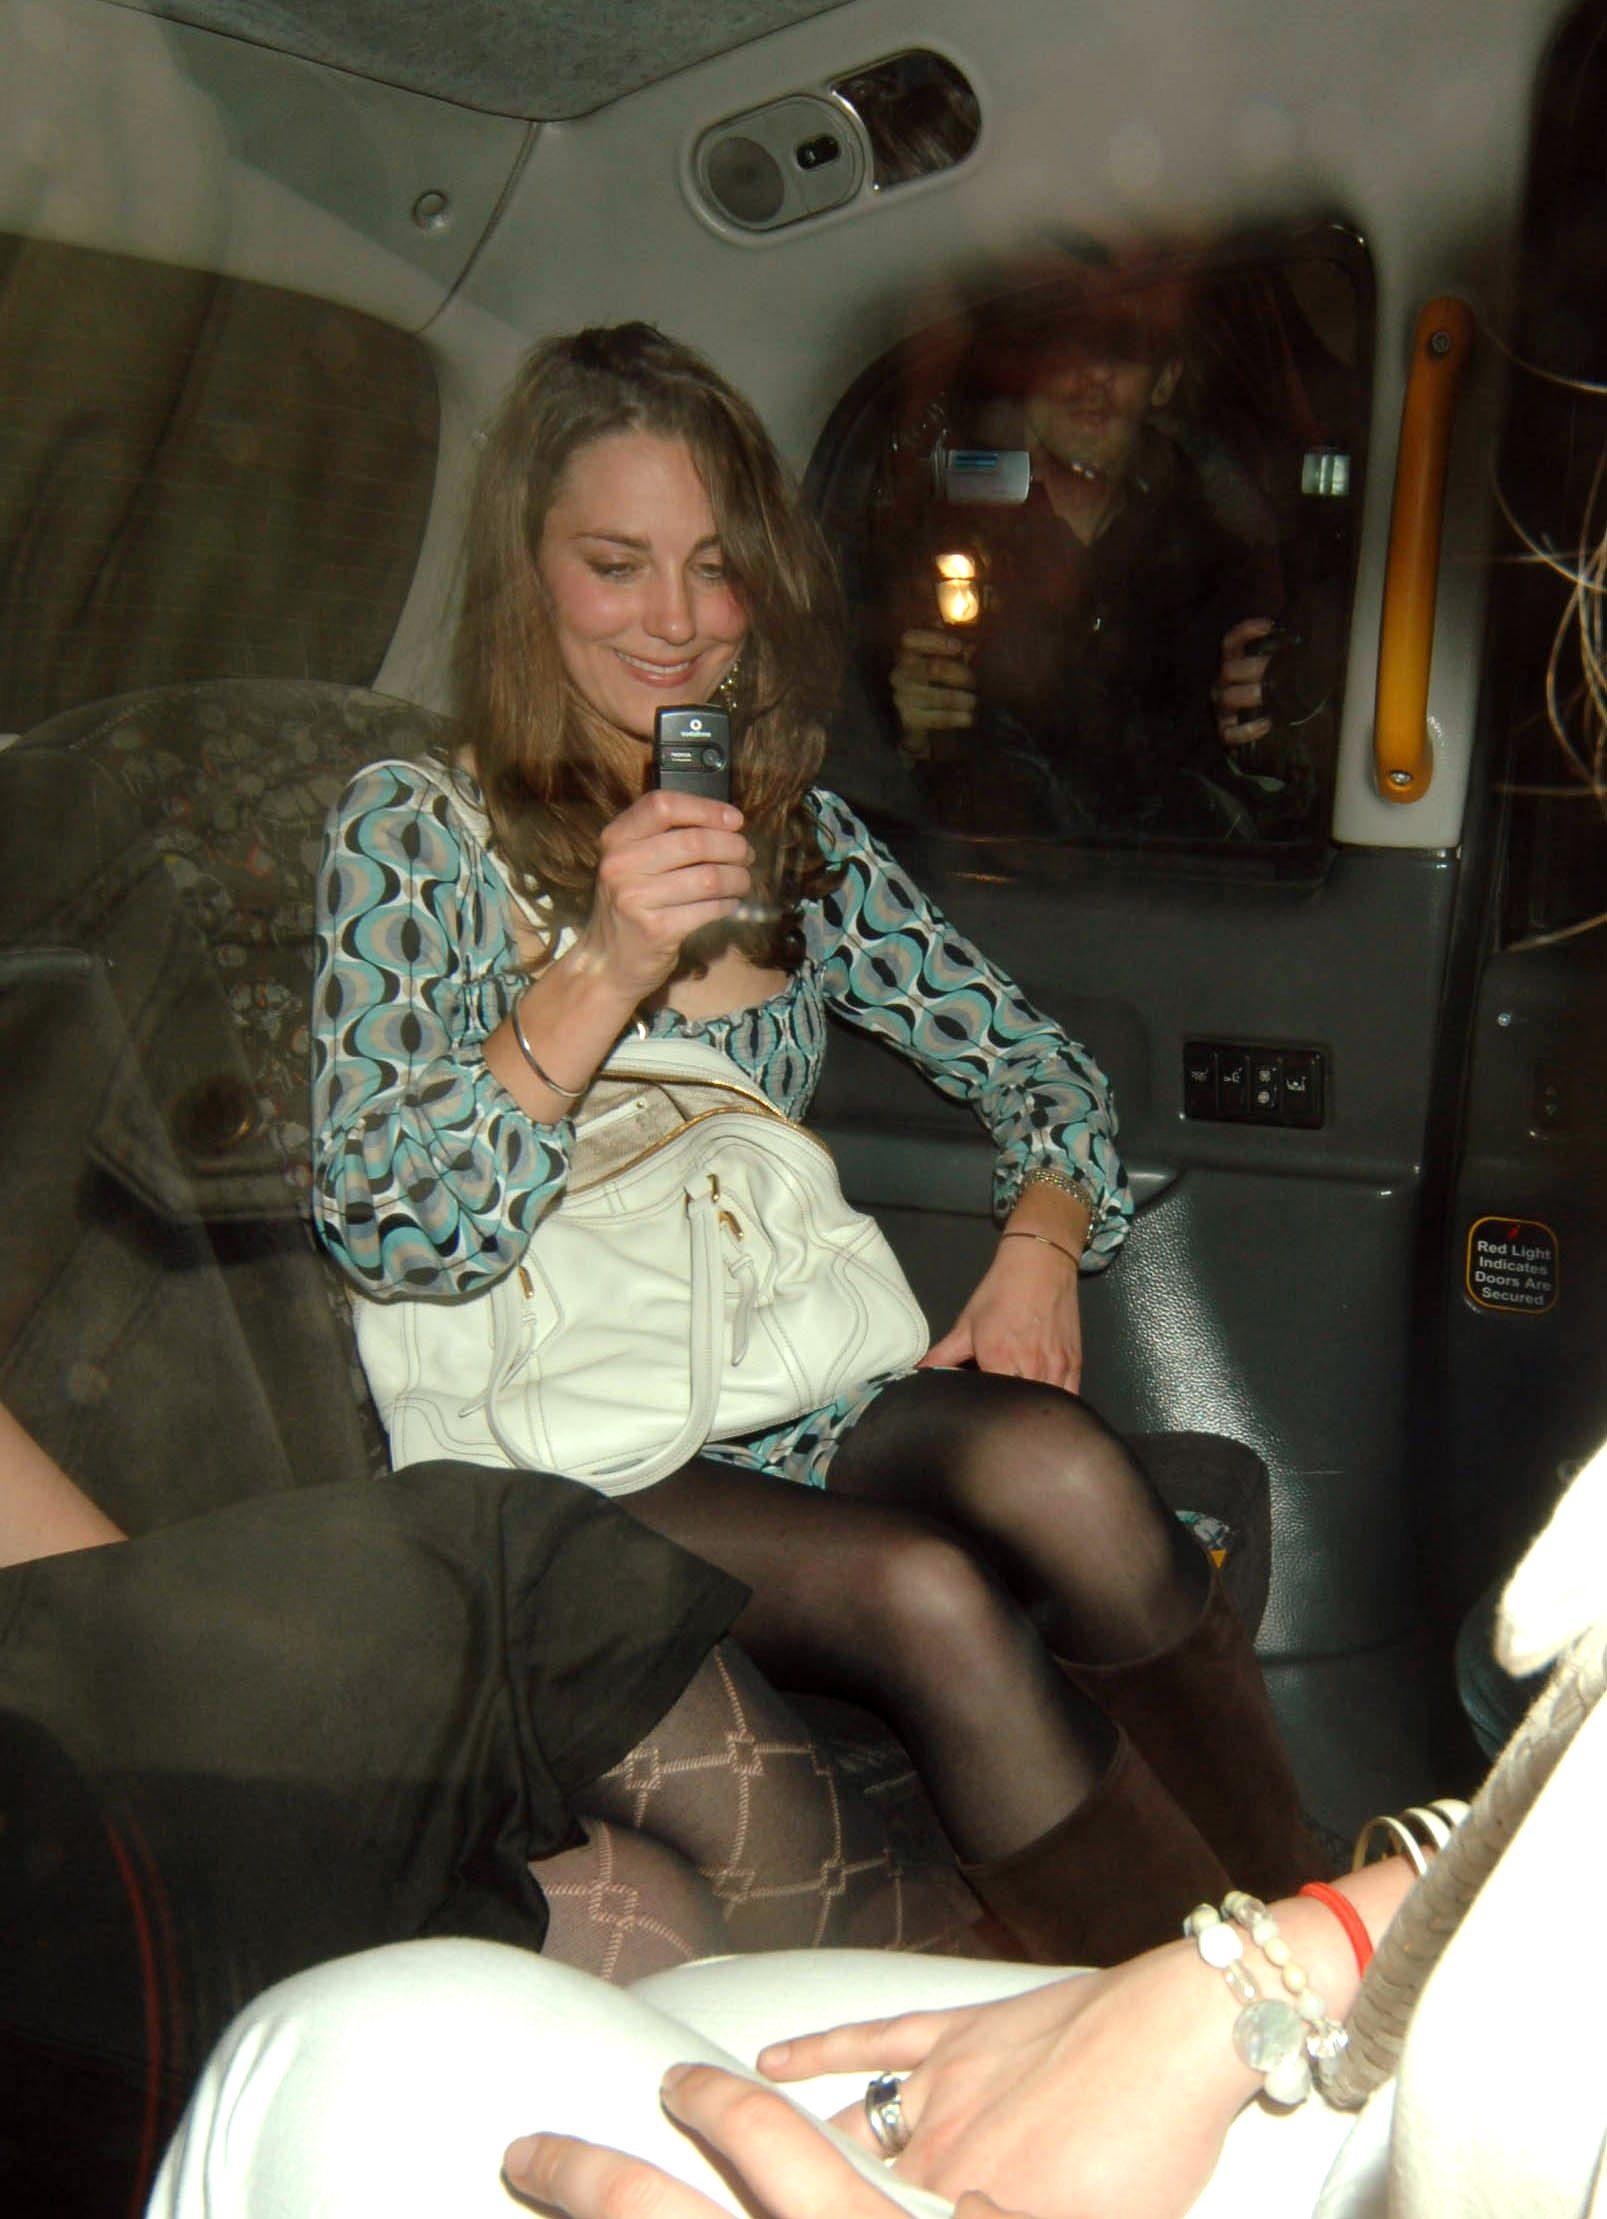 Kate Middleton leaving the Mahiki Club, London, Britain - 19 Apr 2007